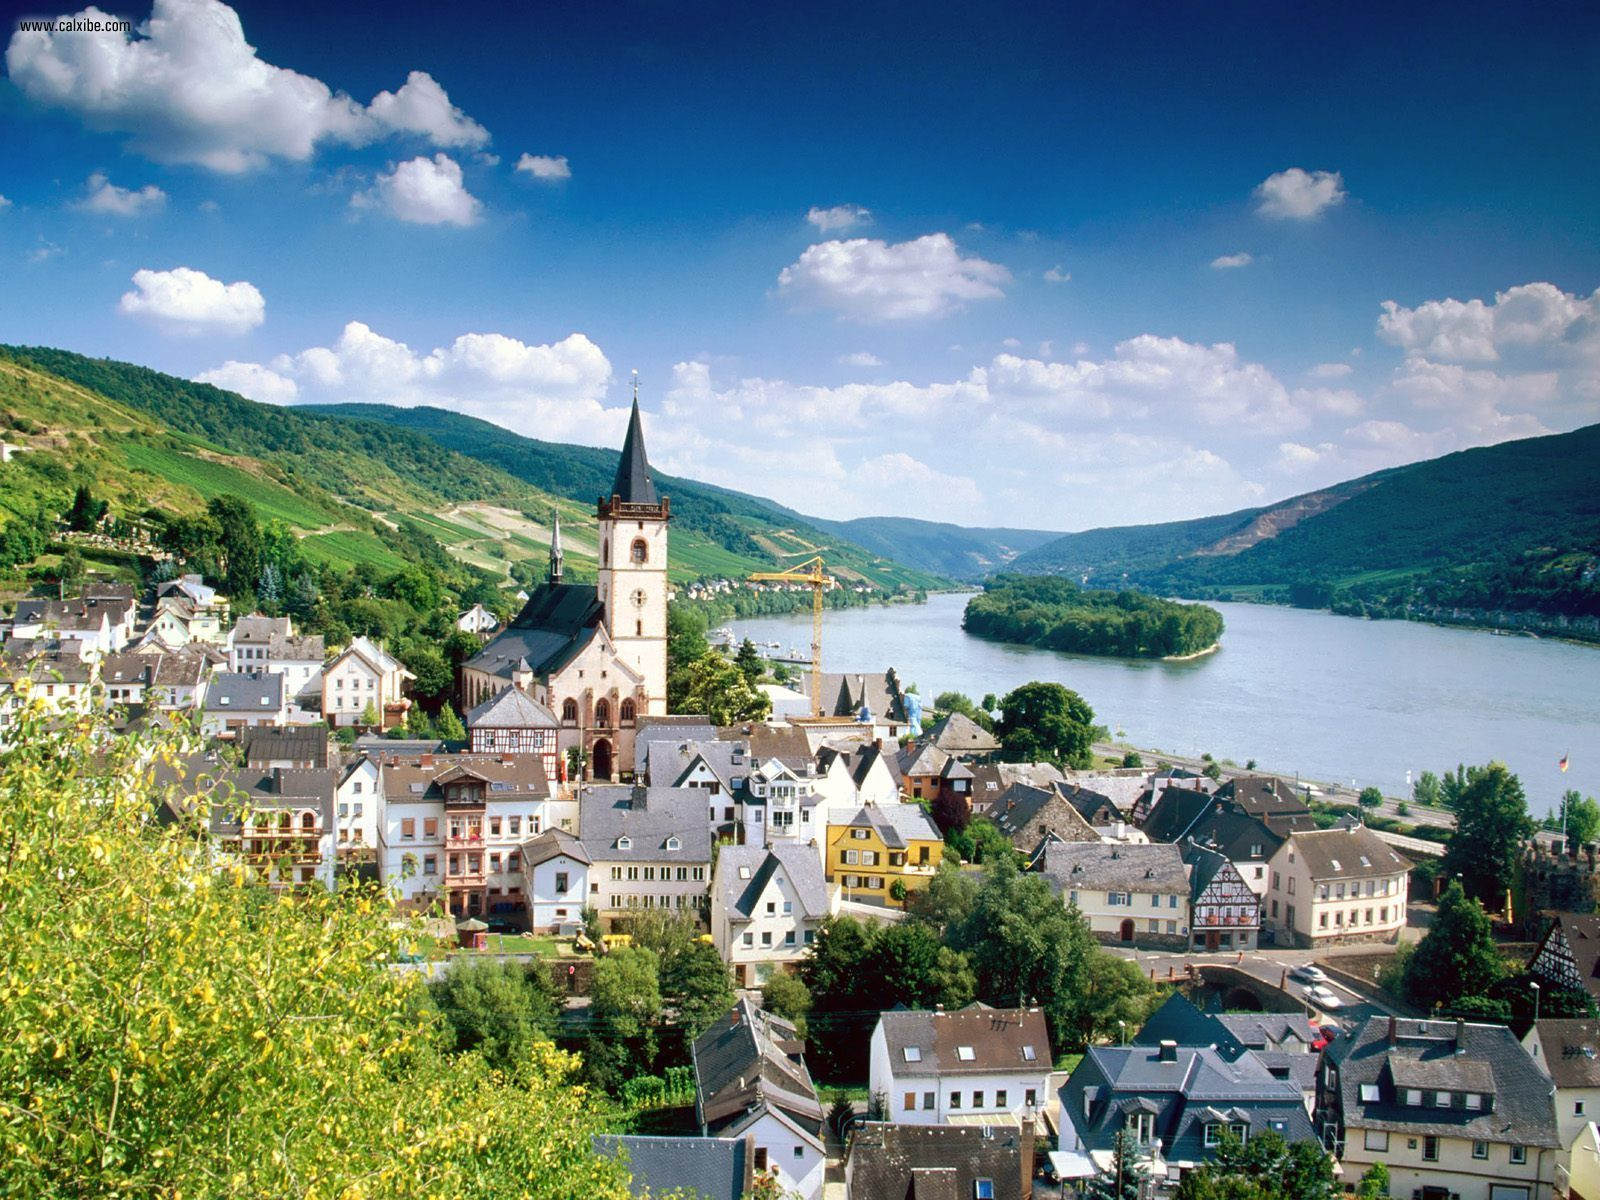 Known places Hesse Rhine River Germany desktop wallpaper nr 19532 1600x1200